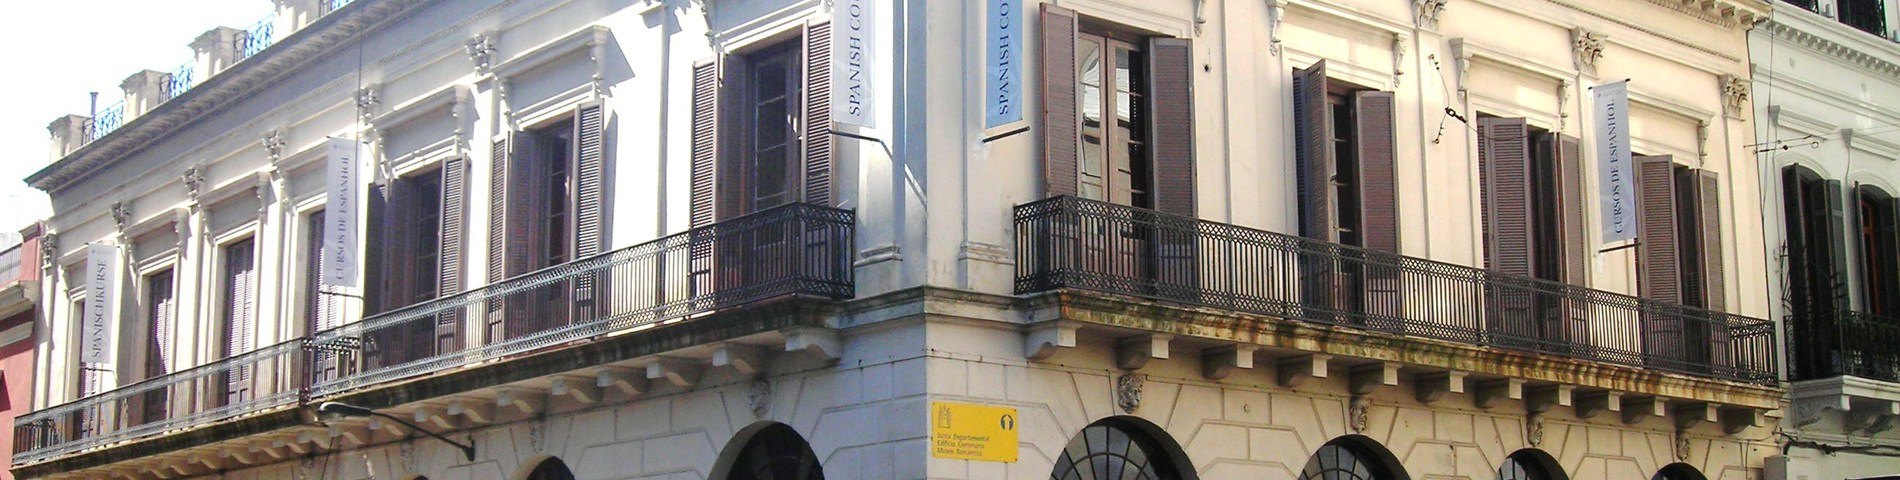 Academia Uruguay bilde 1